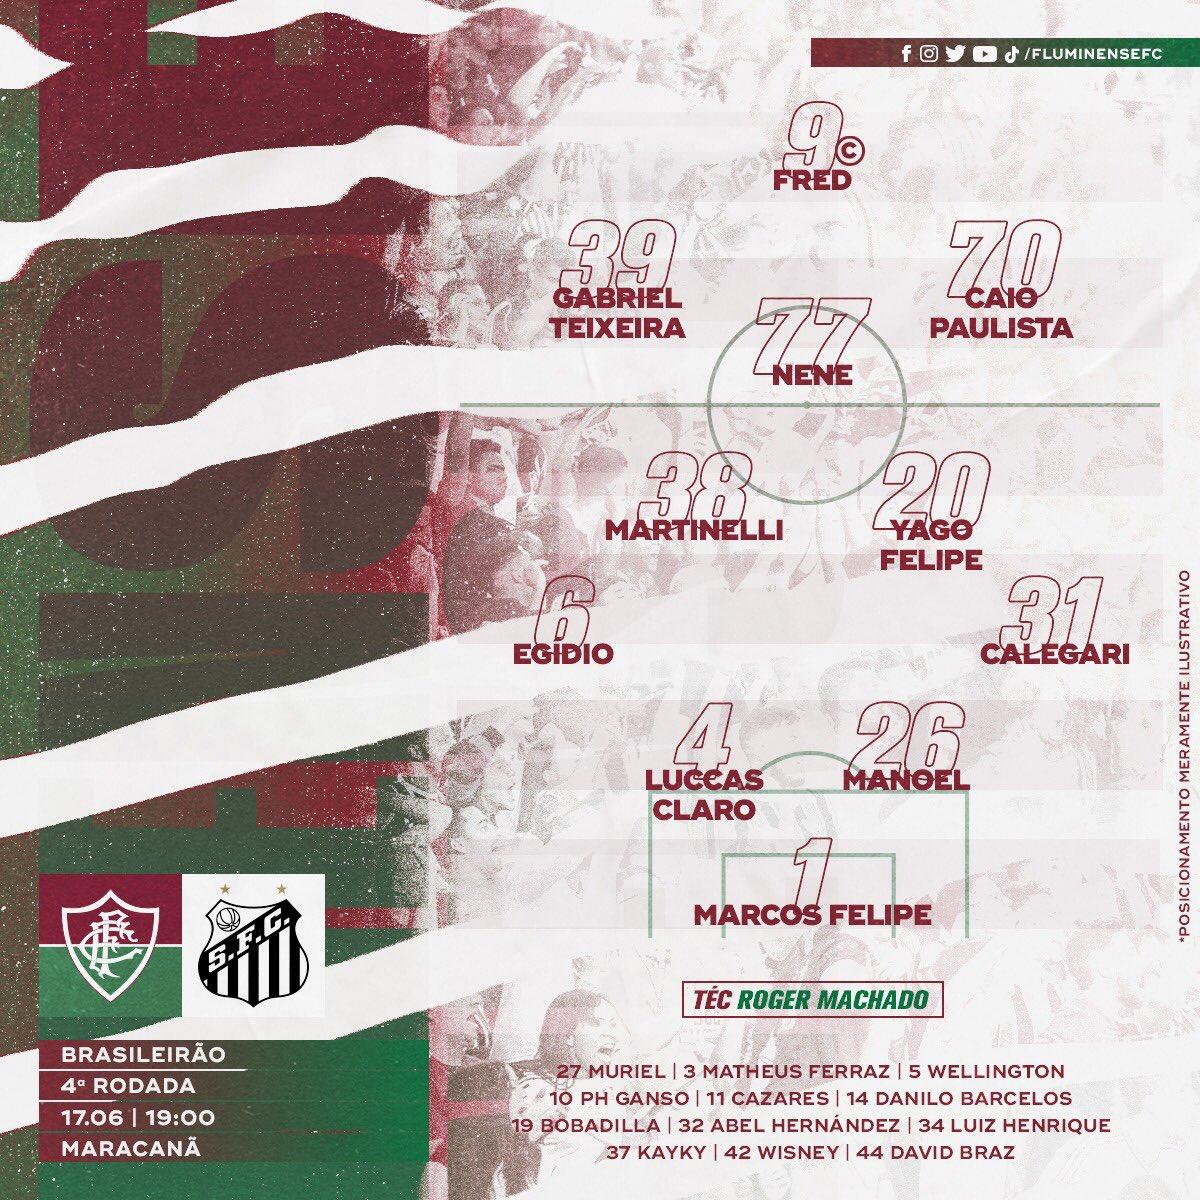 Fluminense escalado para pegar o Santos pela Série A